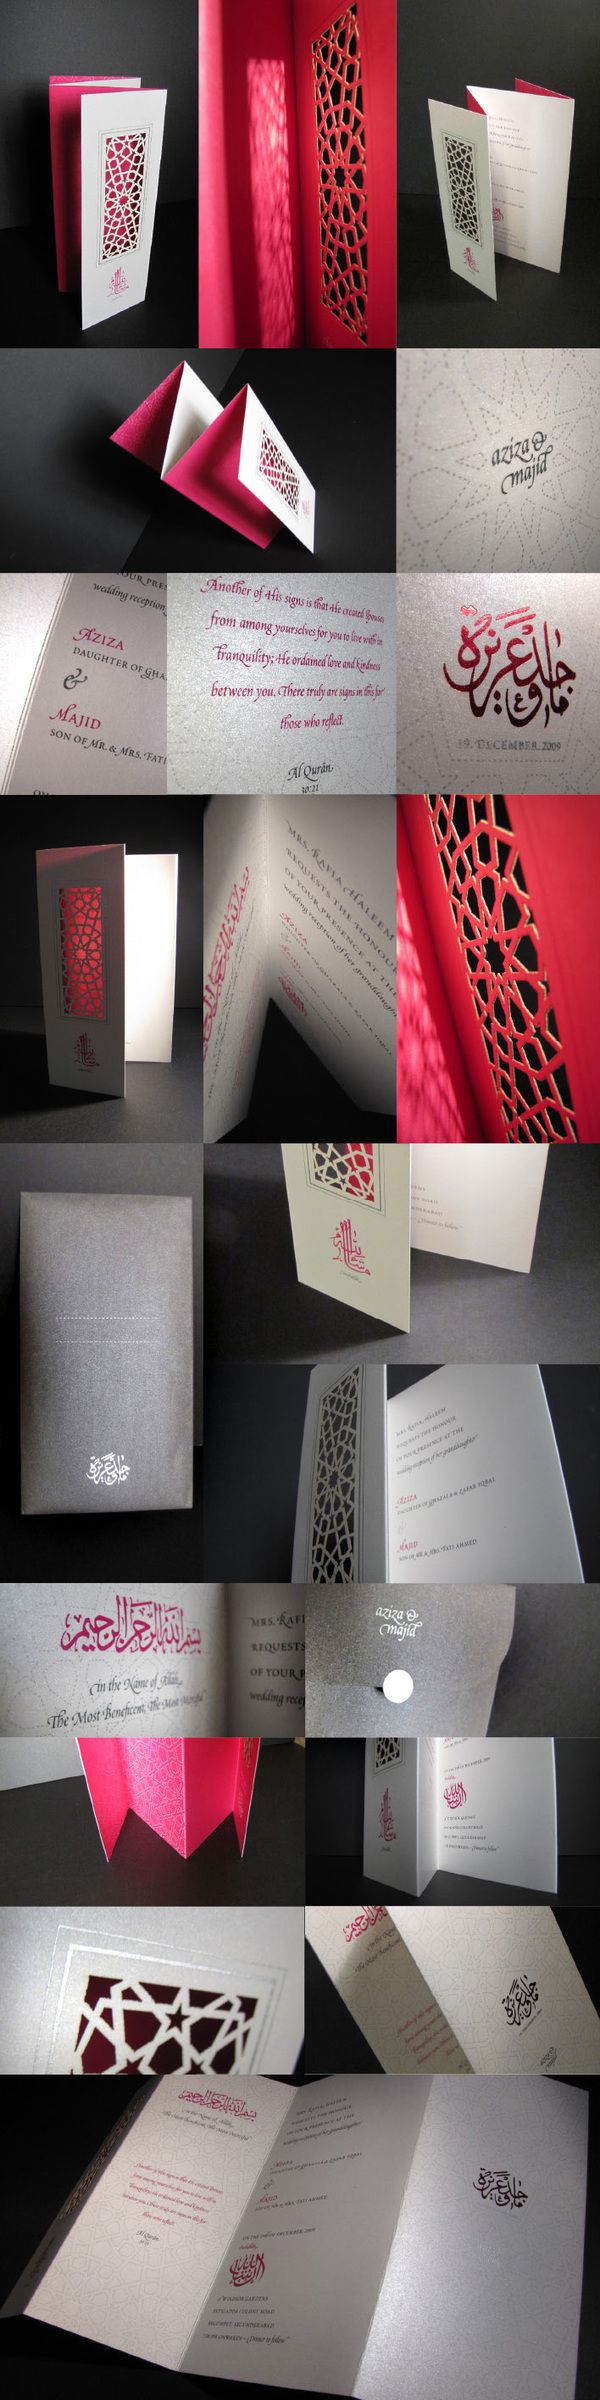 The Wedding ➔ INVITE DESIGN by Aziza Iqbal, via Behance